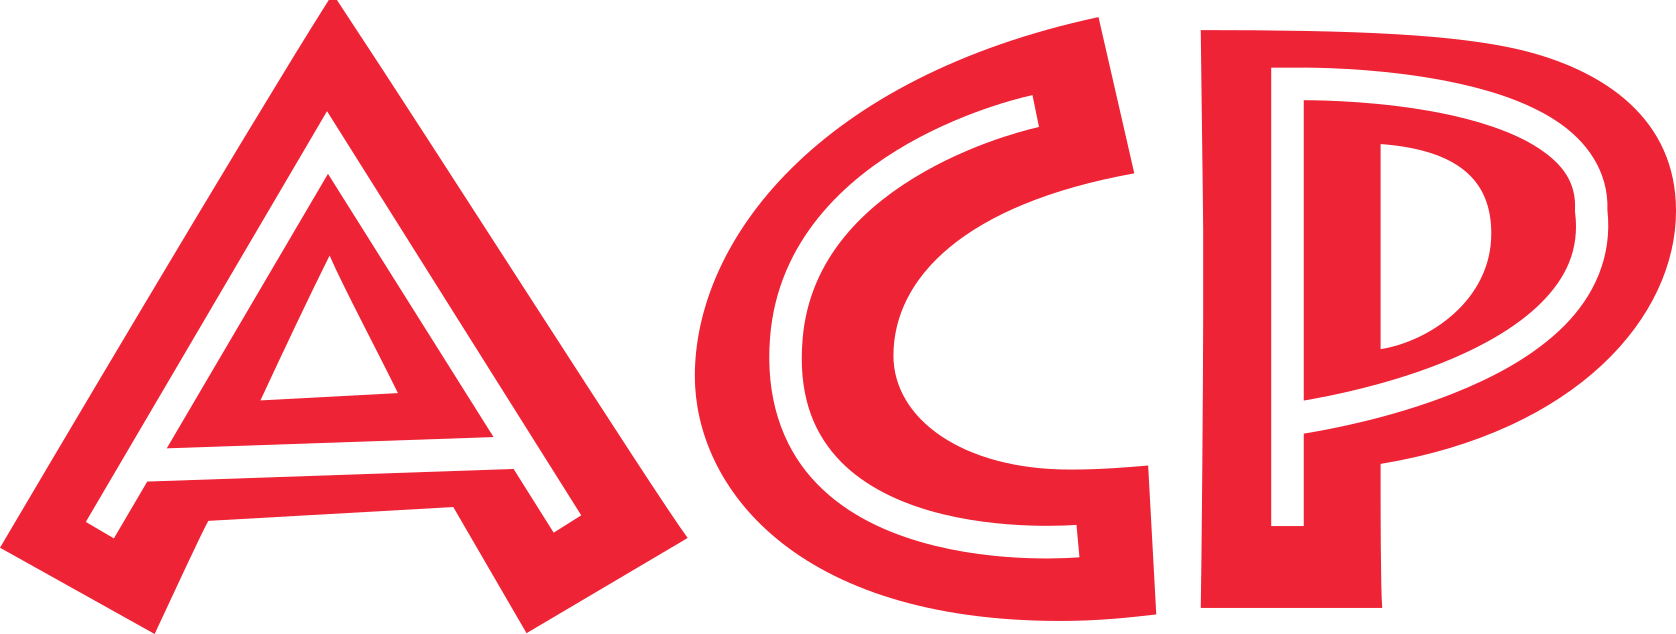 Association for Constraint Programming